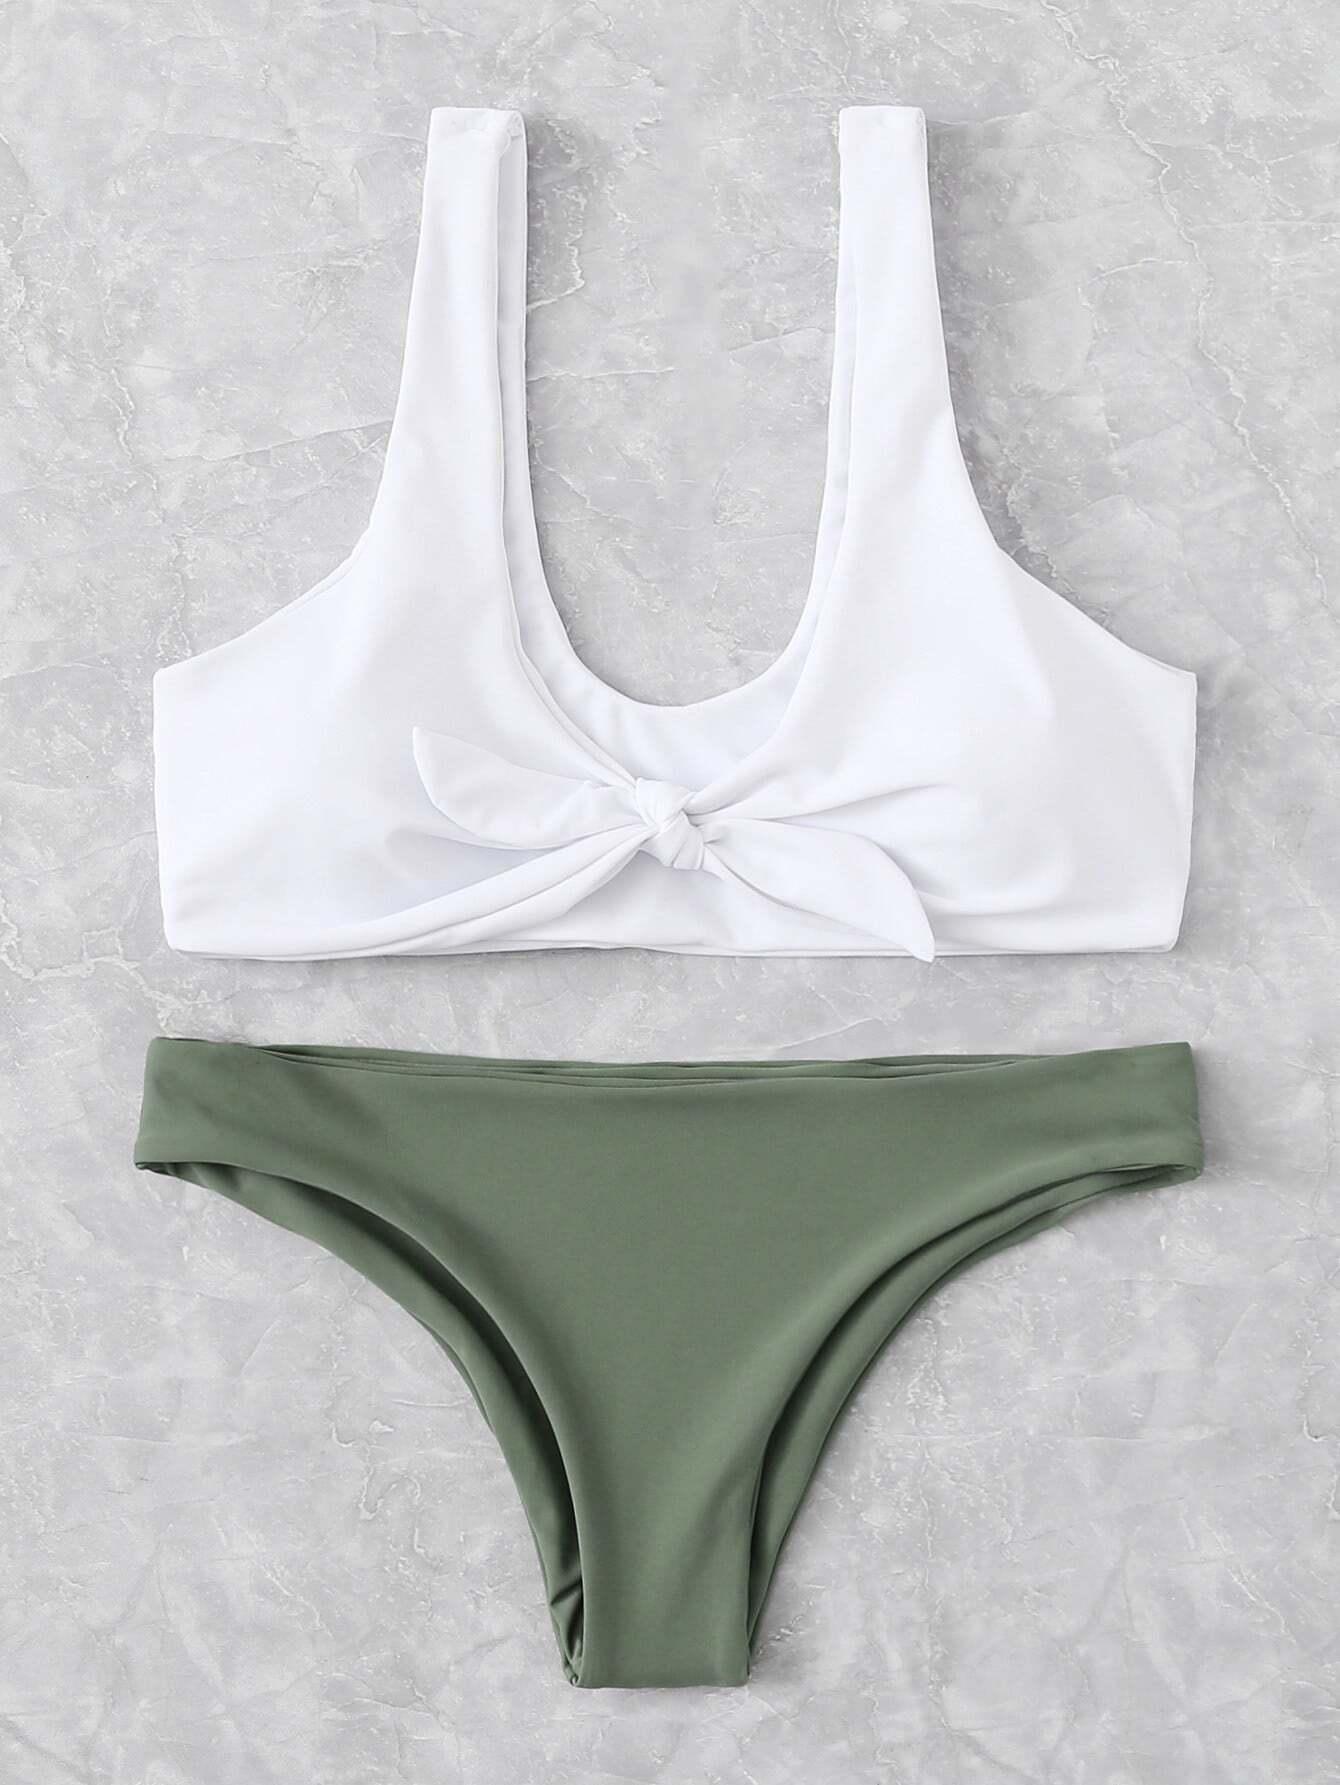 e681b5cd0c5dfa Bow Tie Scoop Neck Top With Hipster Bikini Set EmmaCloth-Women Fast ...